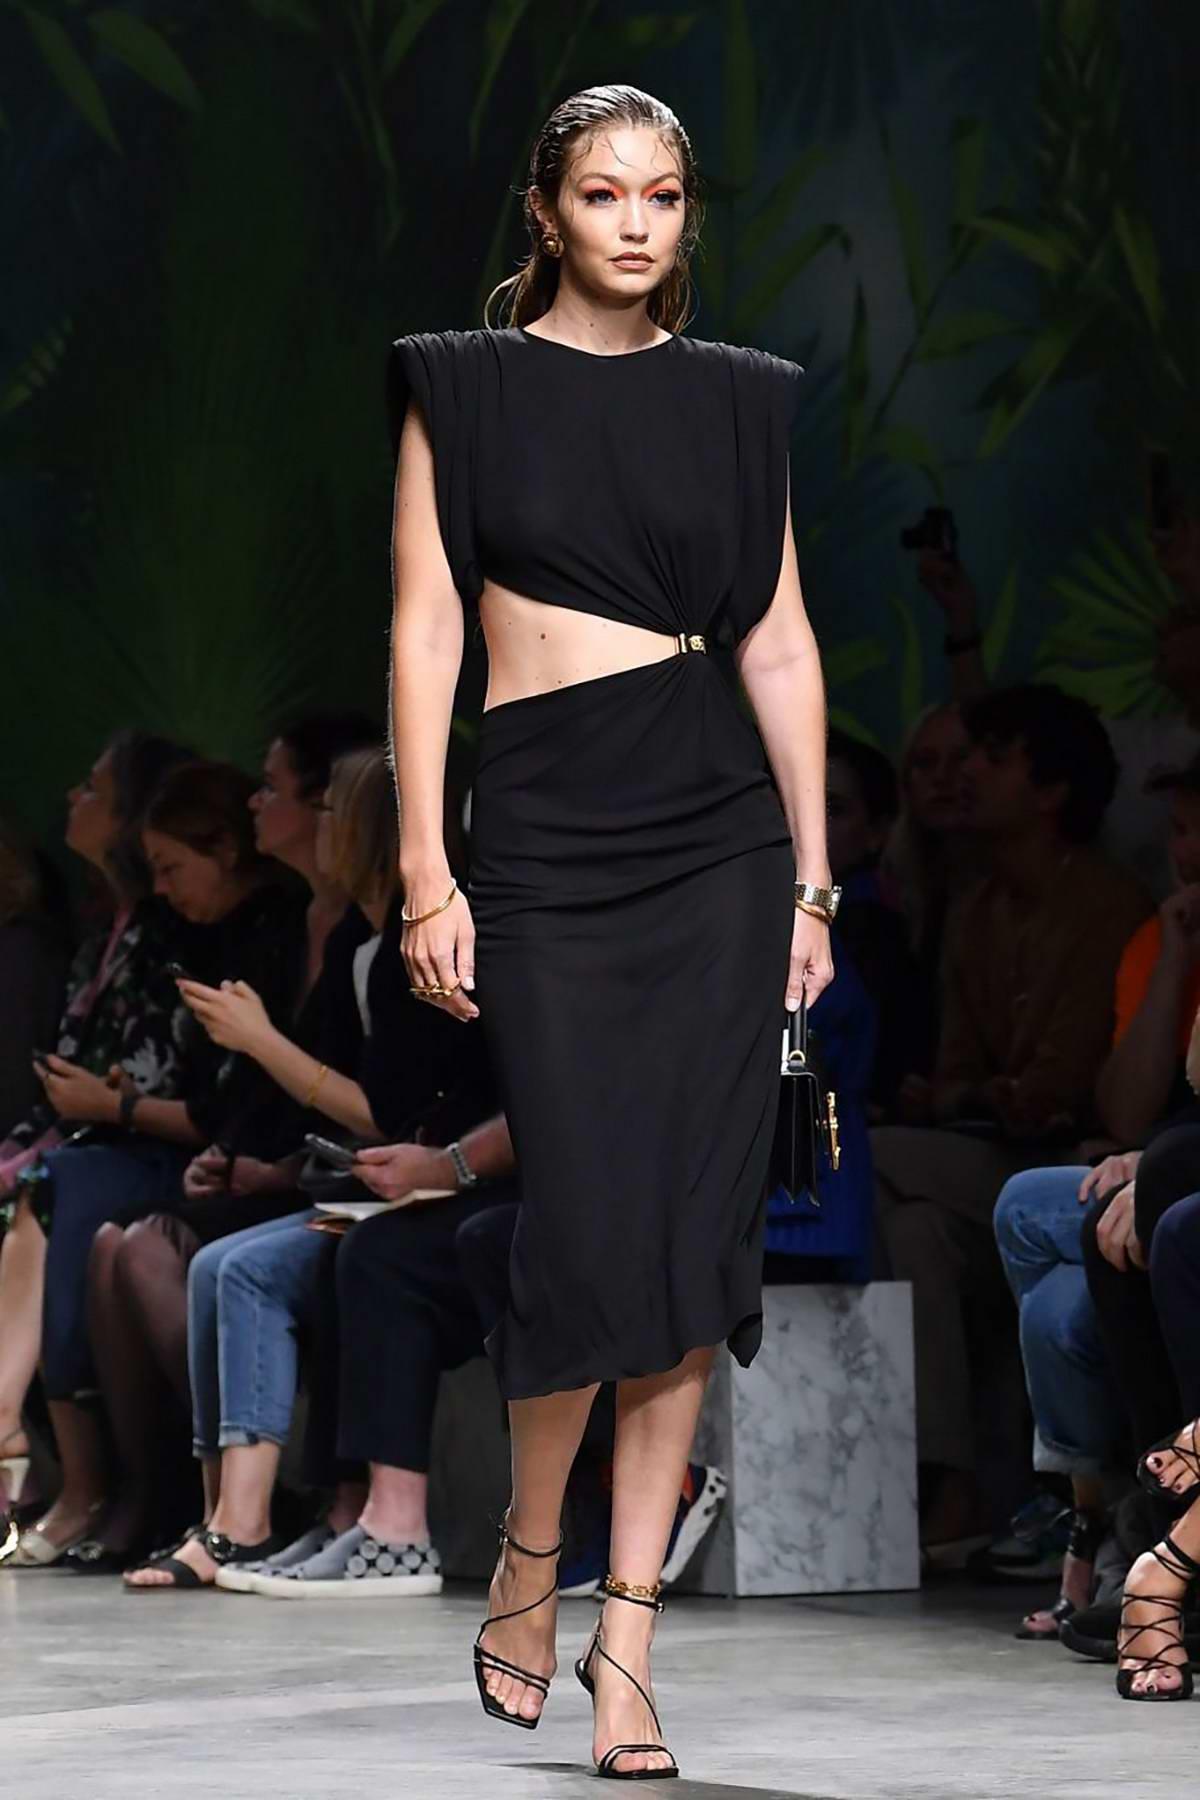 Gigi Hadid Walks The Runway At The Versace Show During Milan Fashion Week Spring Summer 2020